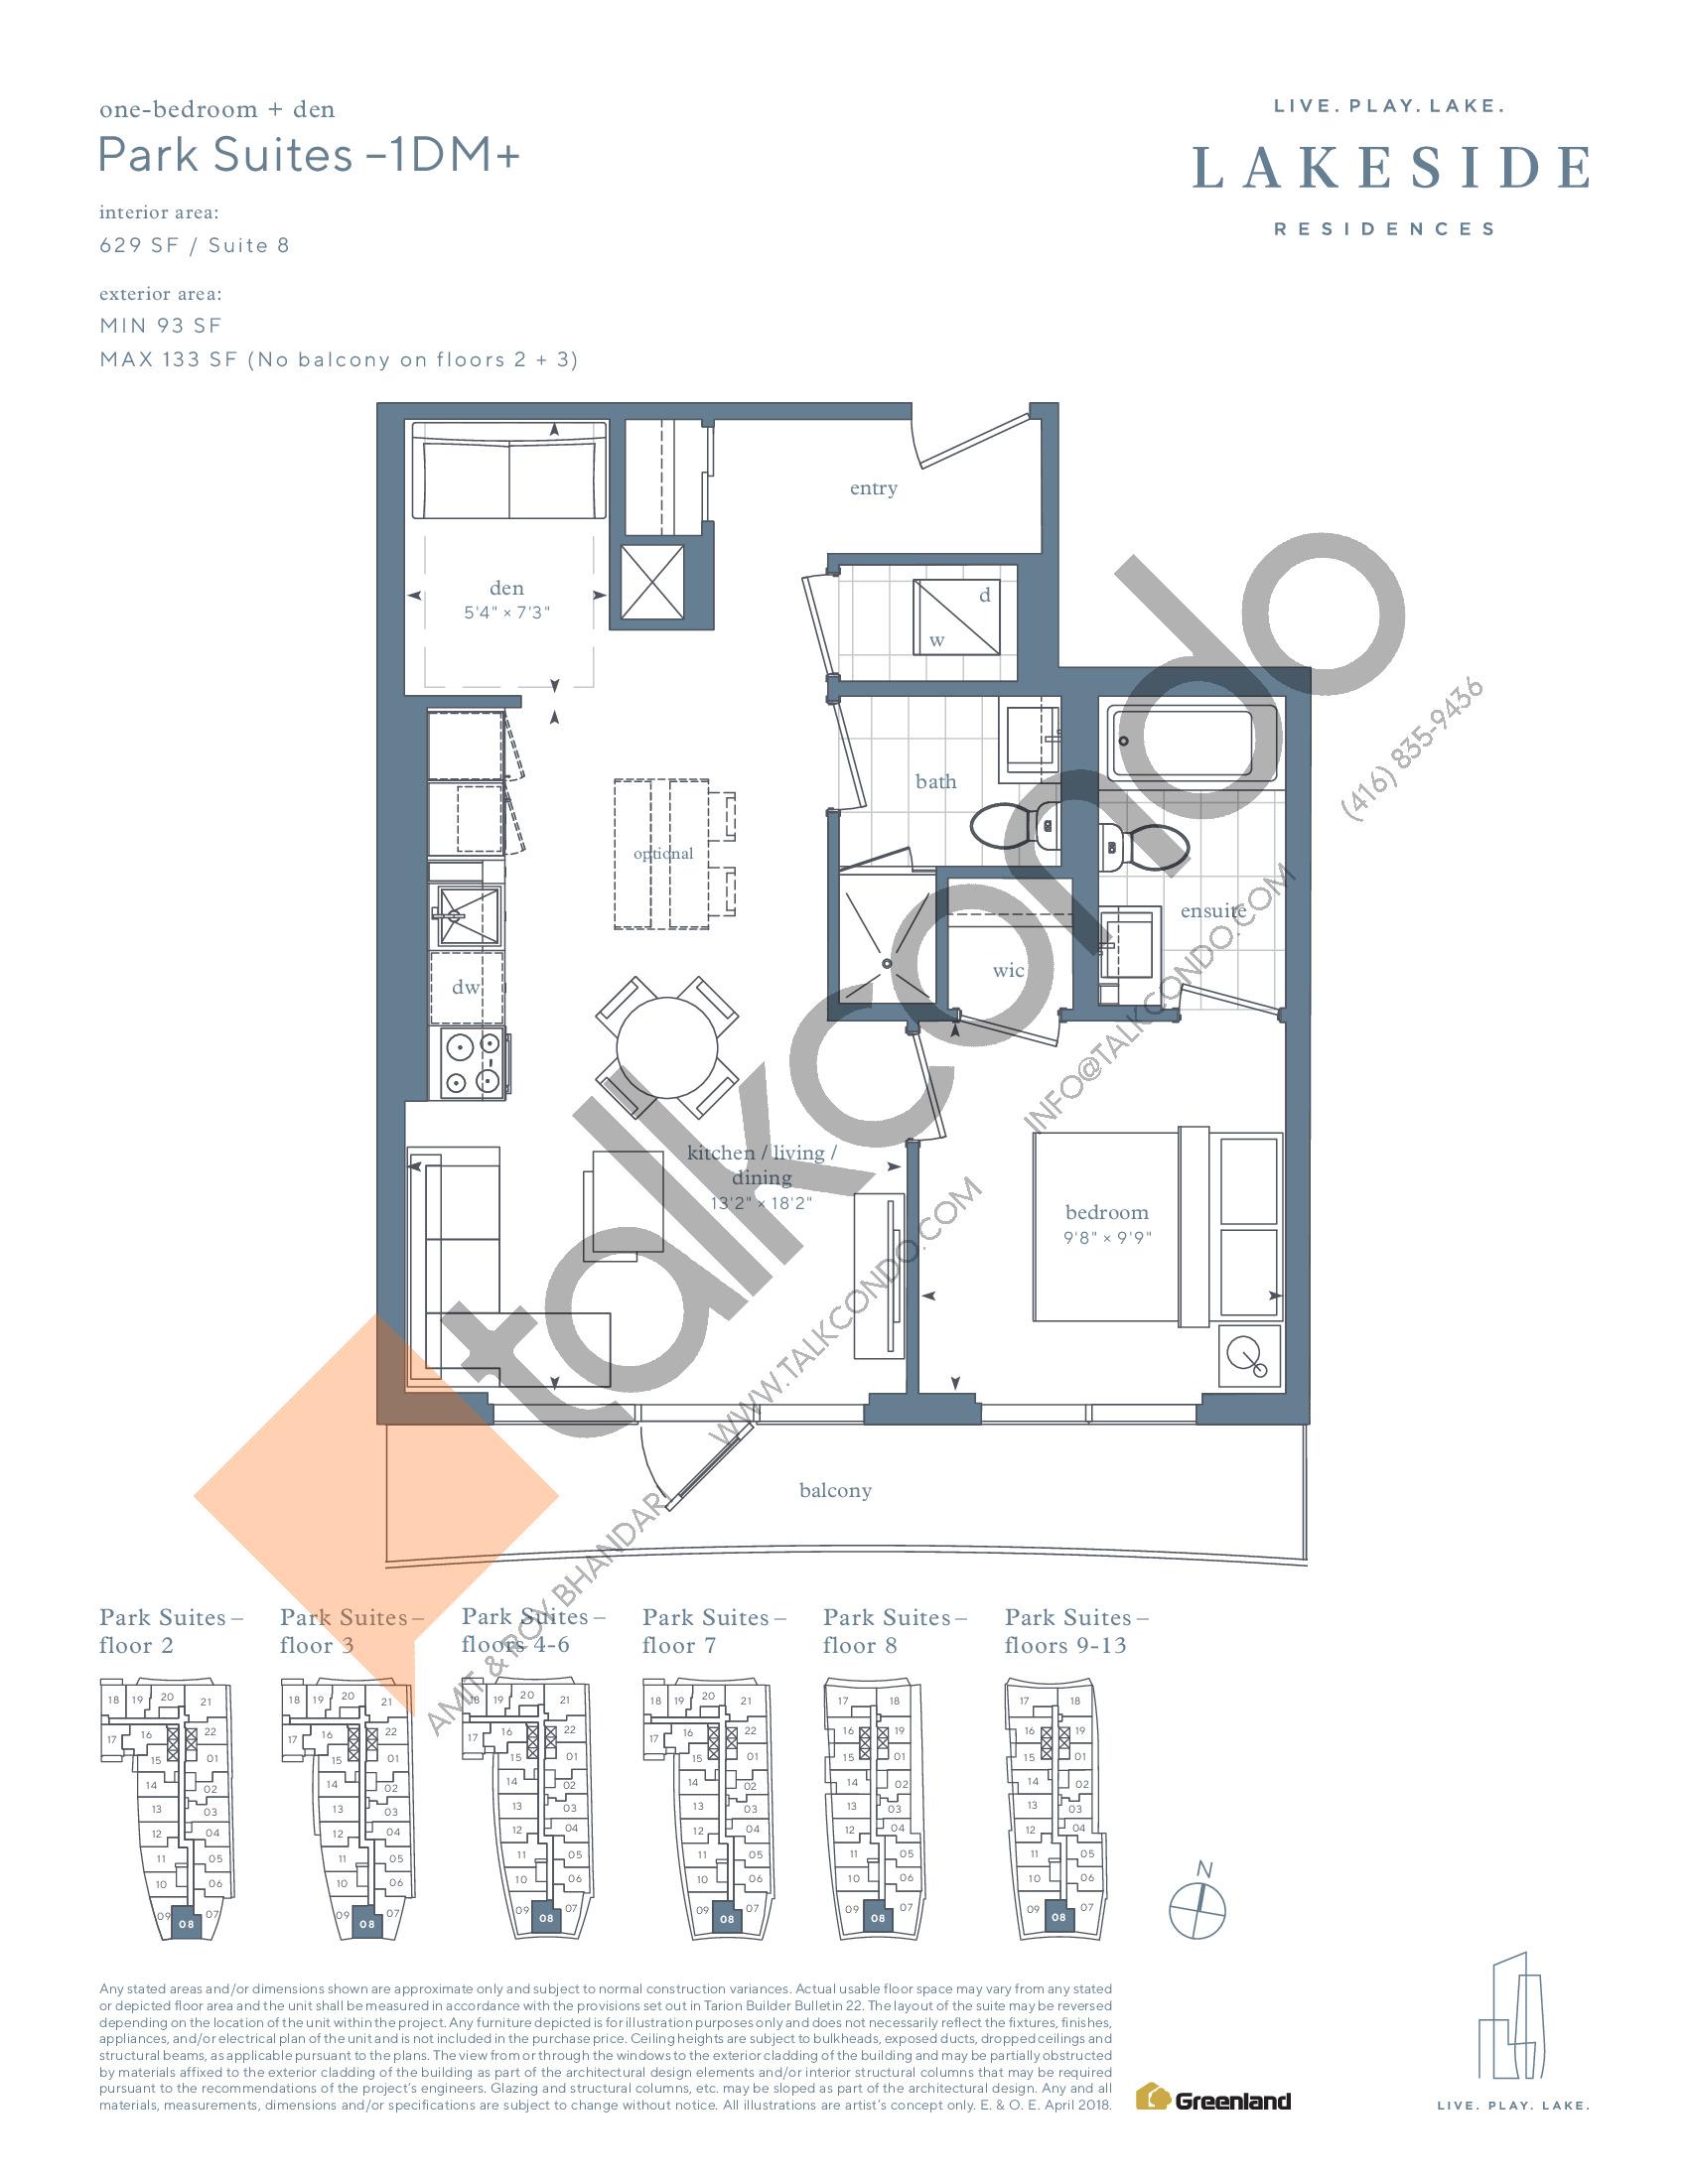 Park Suites - 1DM+ Floor Plan at Lakeside Residences - 629 sq.ft